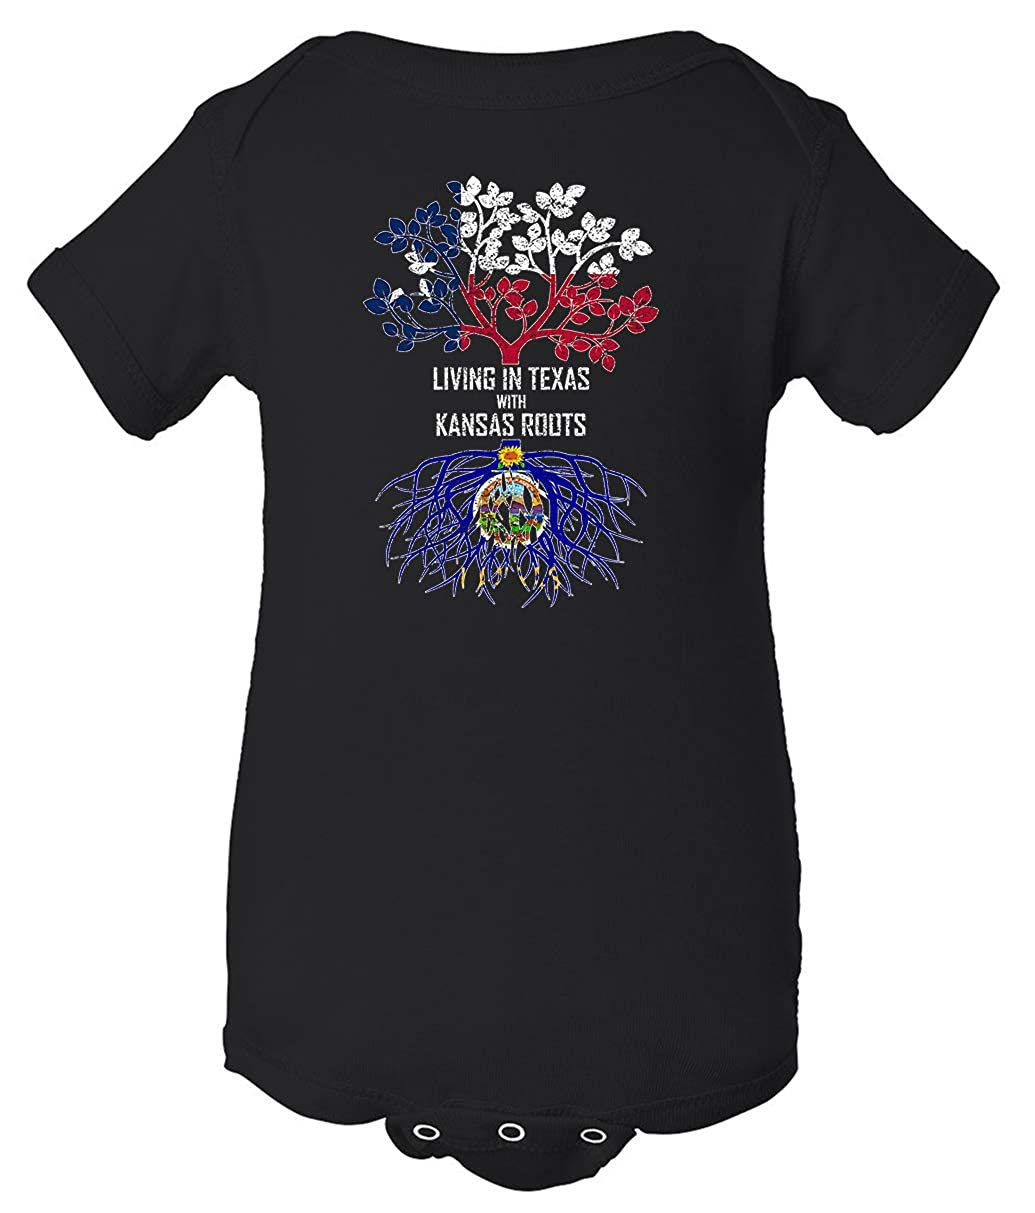 Tenacitee Babys Living in Texas Kansas Roots Shirt